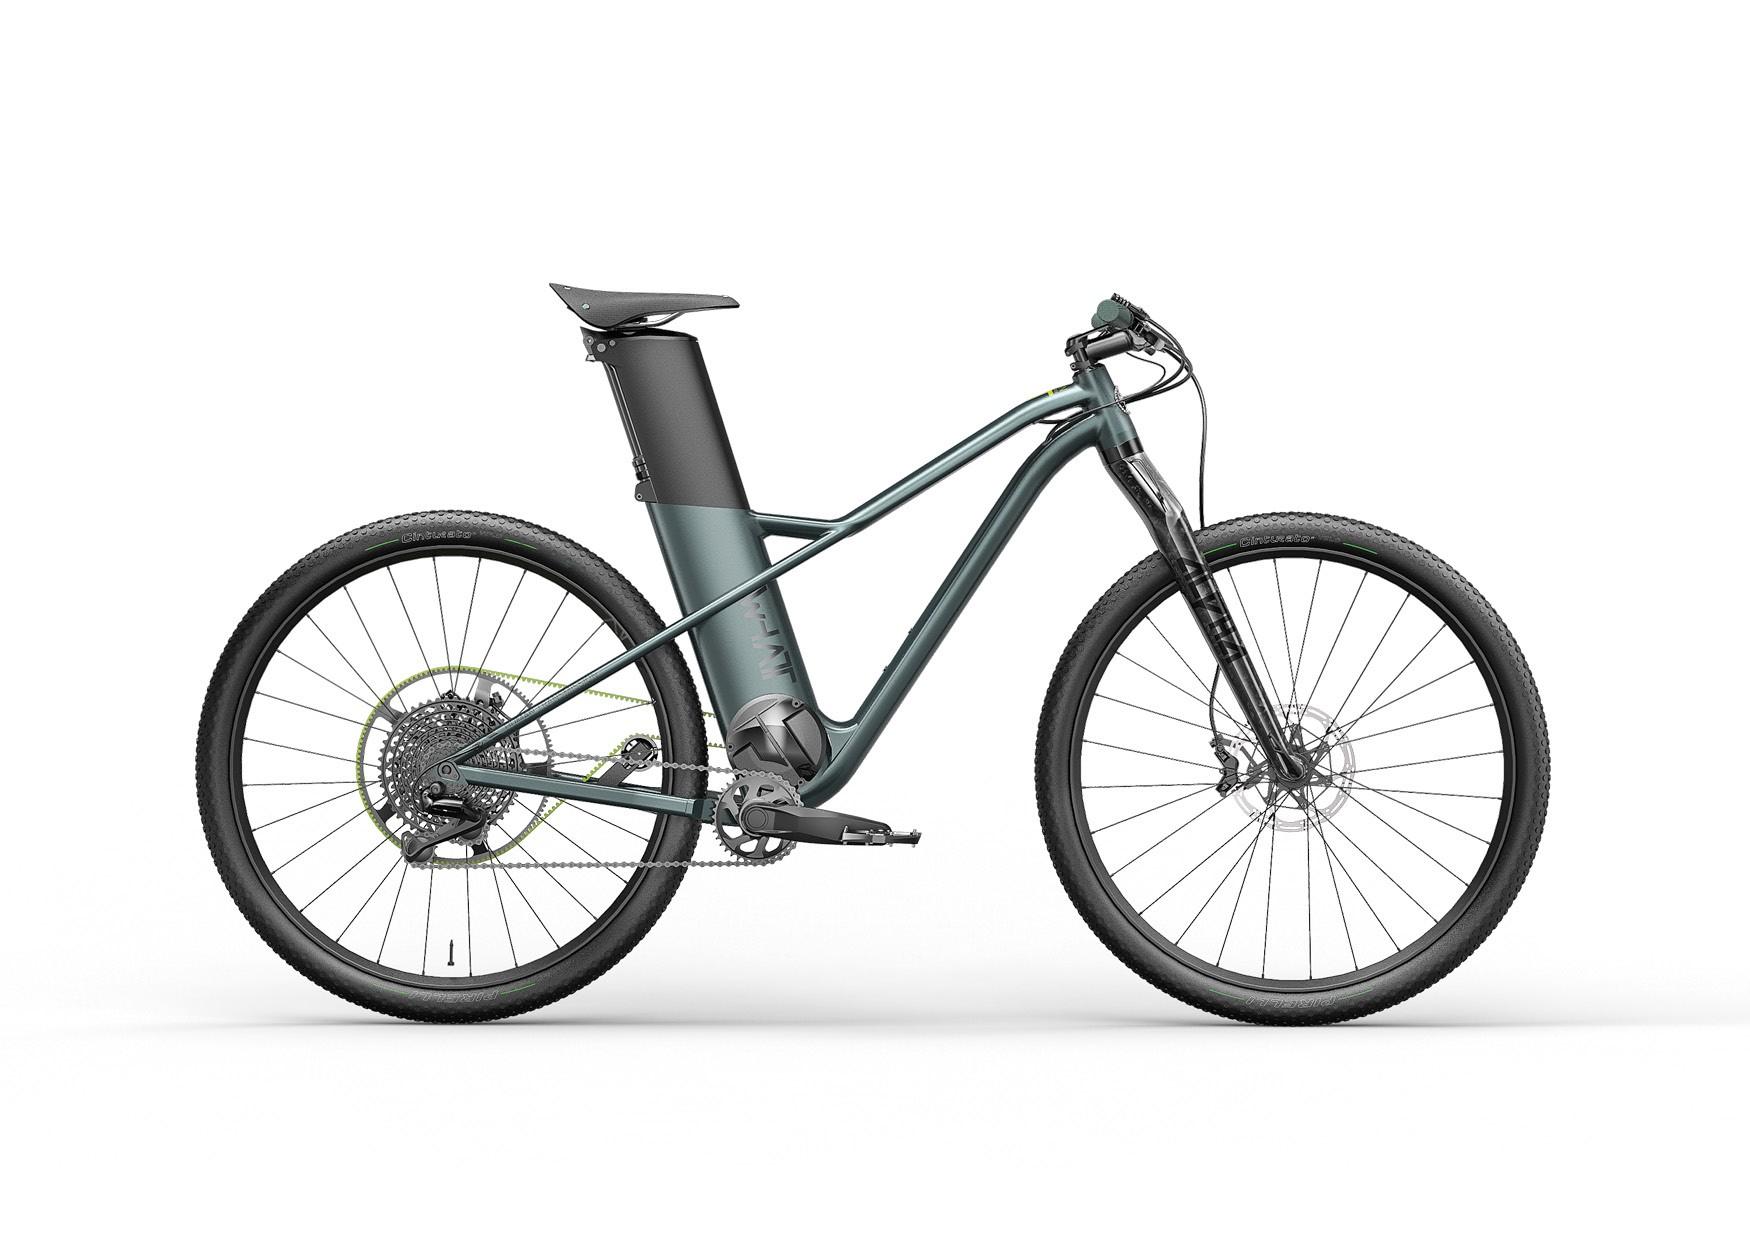 Vélo électrique whaTTfornow - GaasWatt Marseille